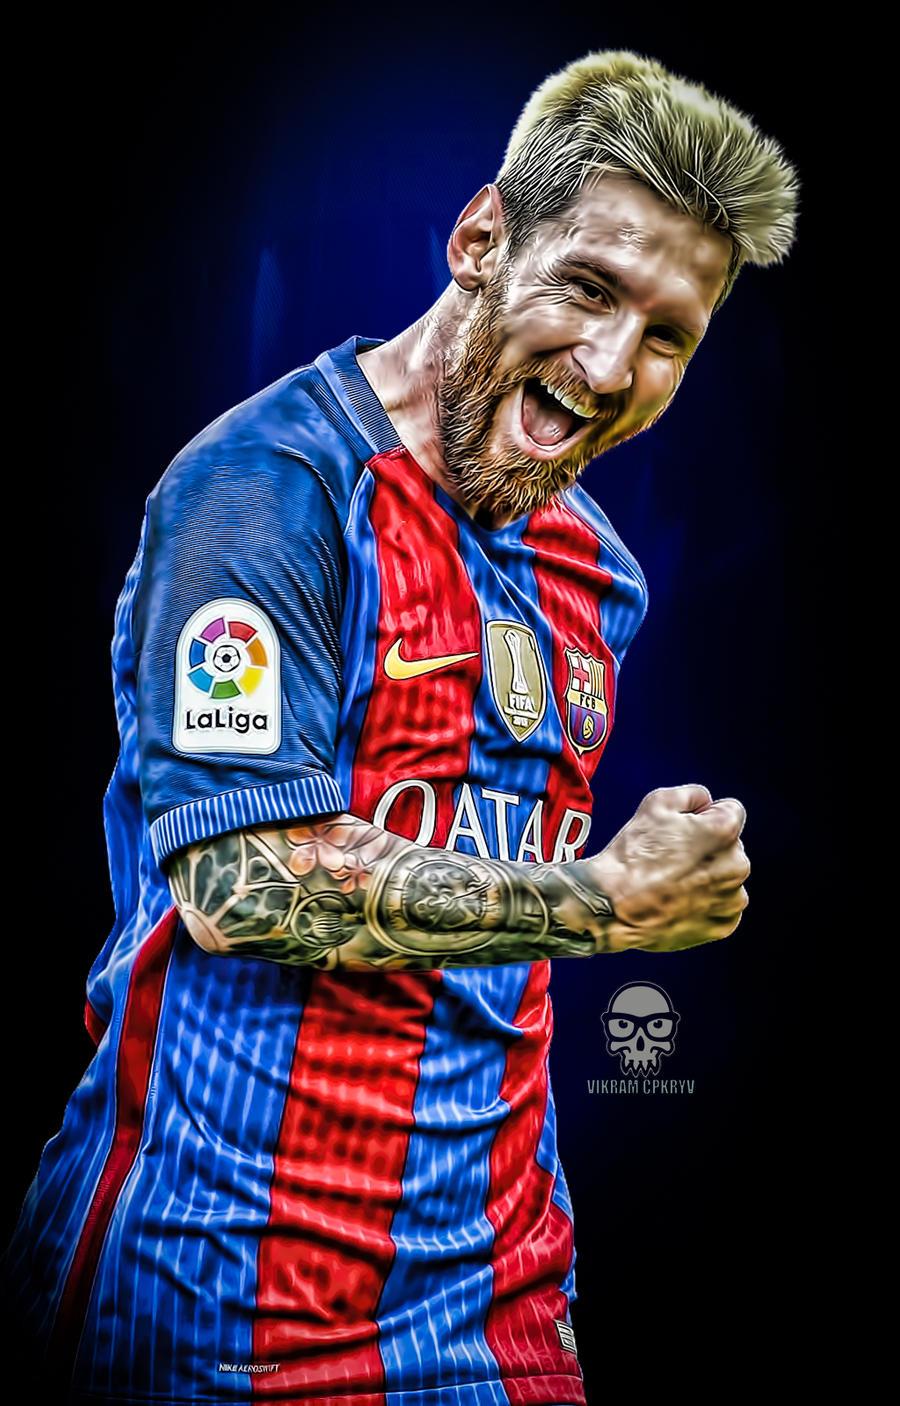 Messi Fc Barcelona Lockscreen Wallpaper By Vikramcpkryv On